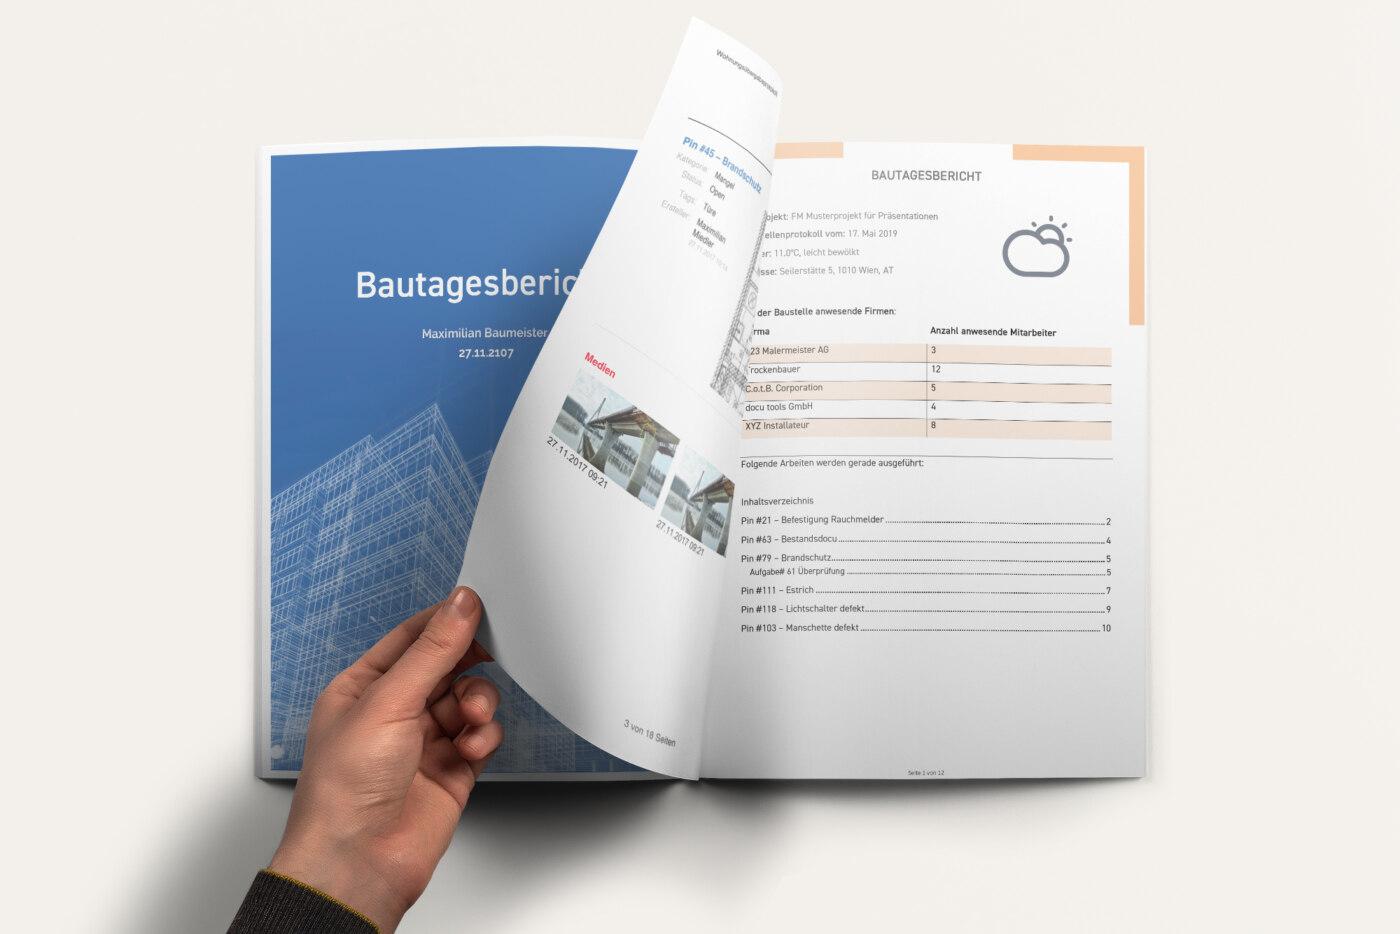 bautagebuch_docu-tools